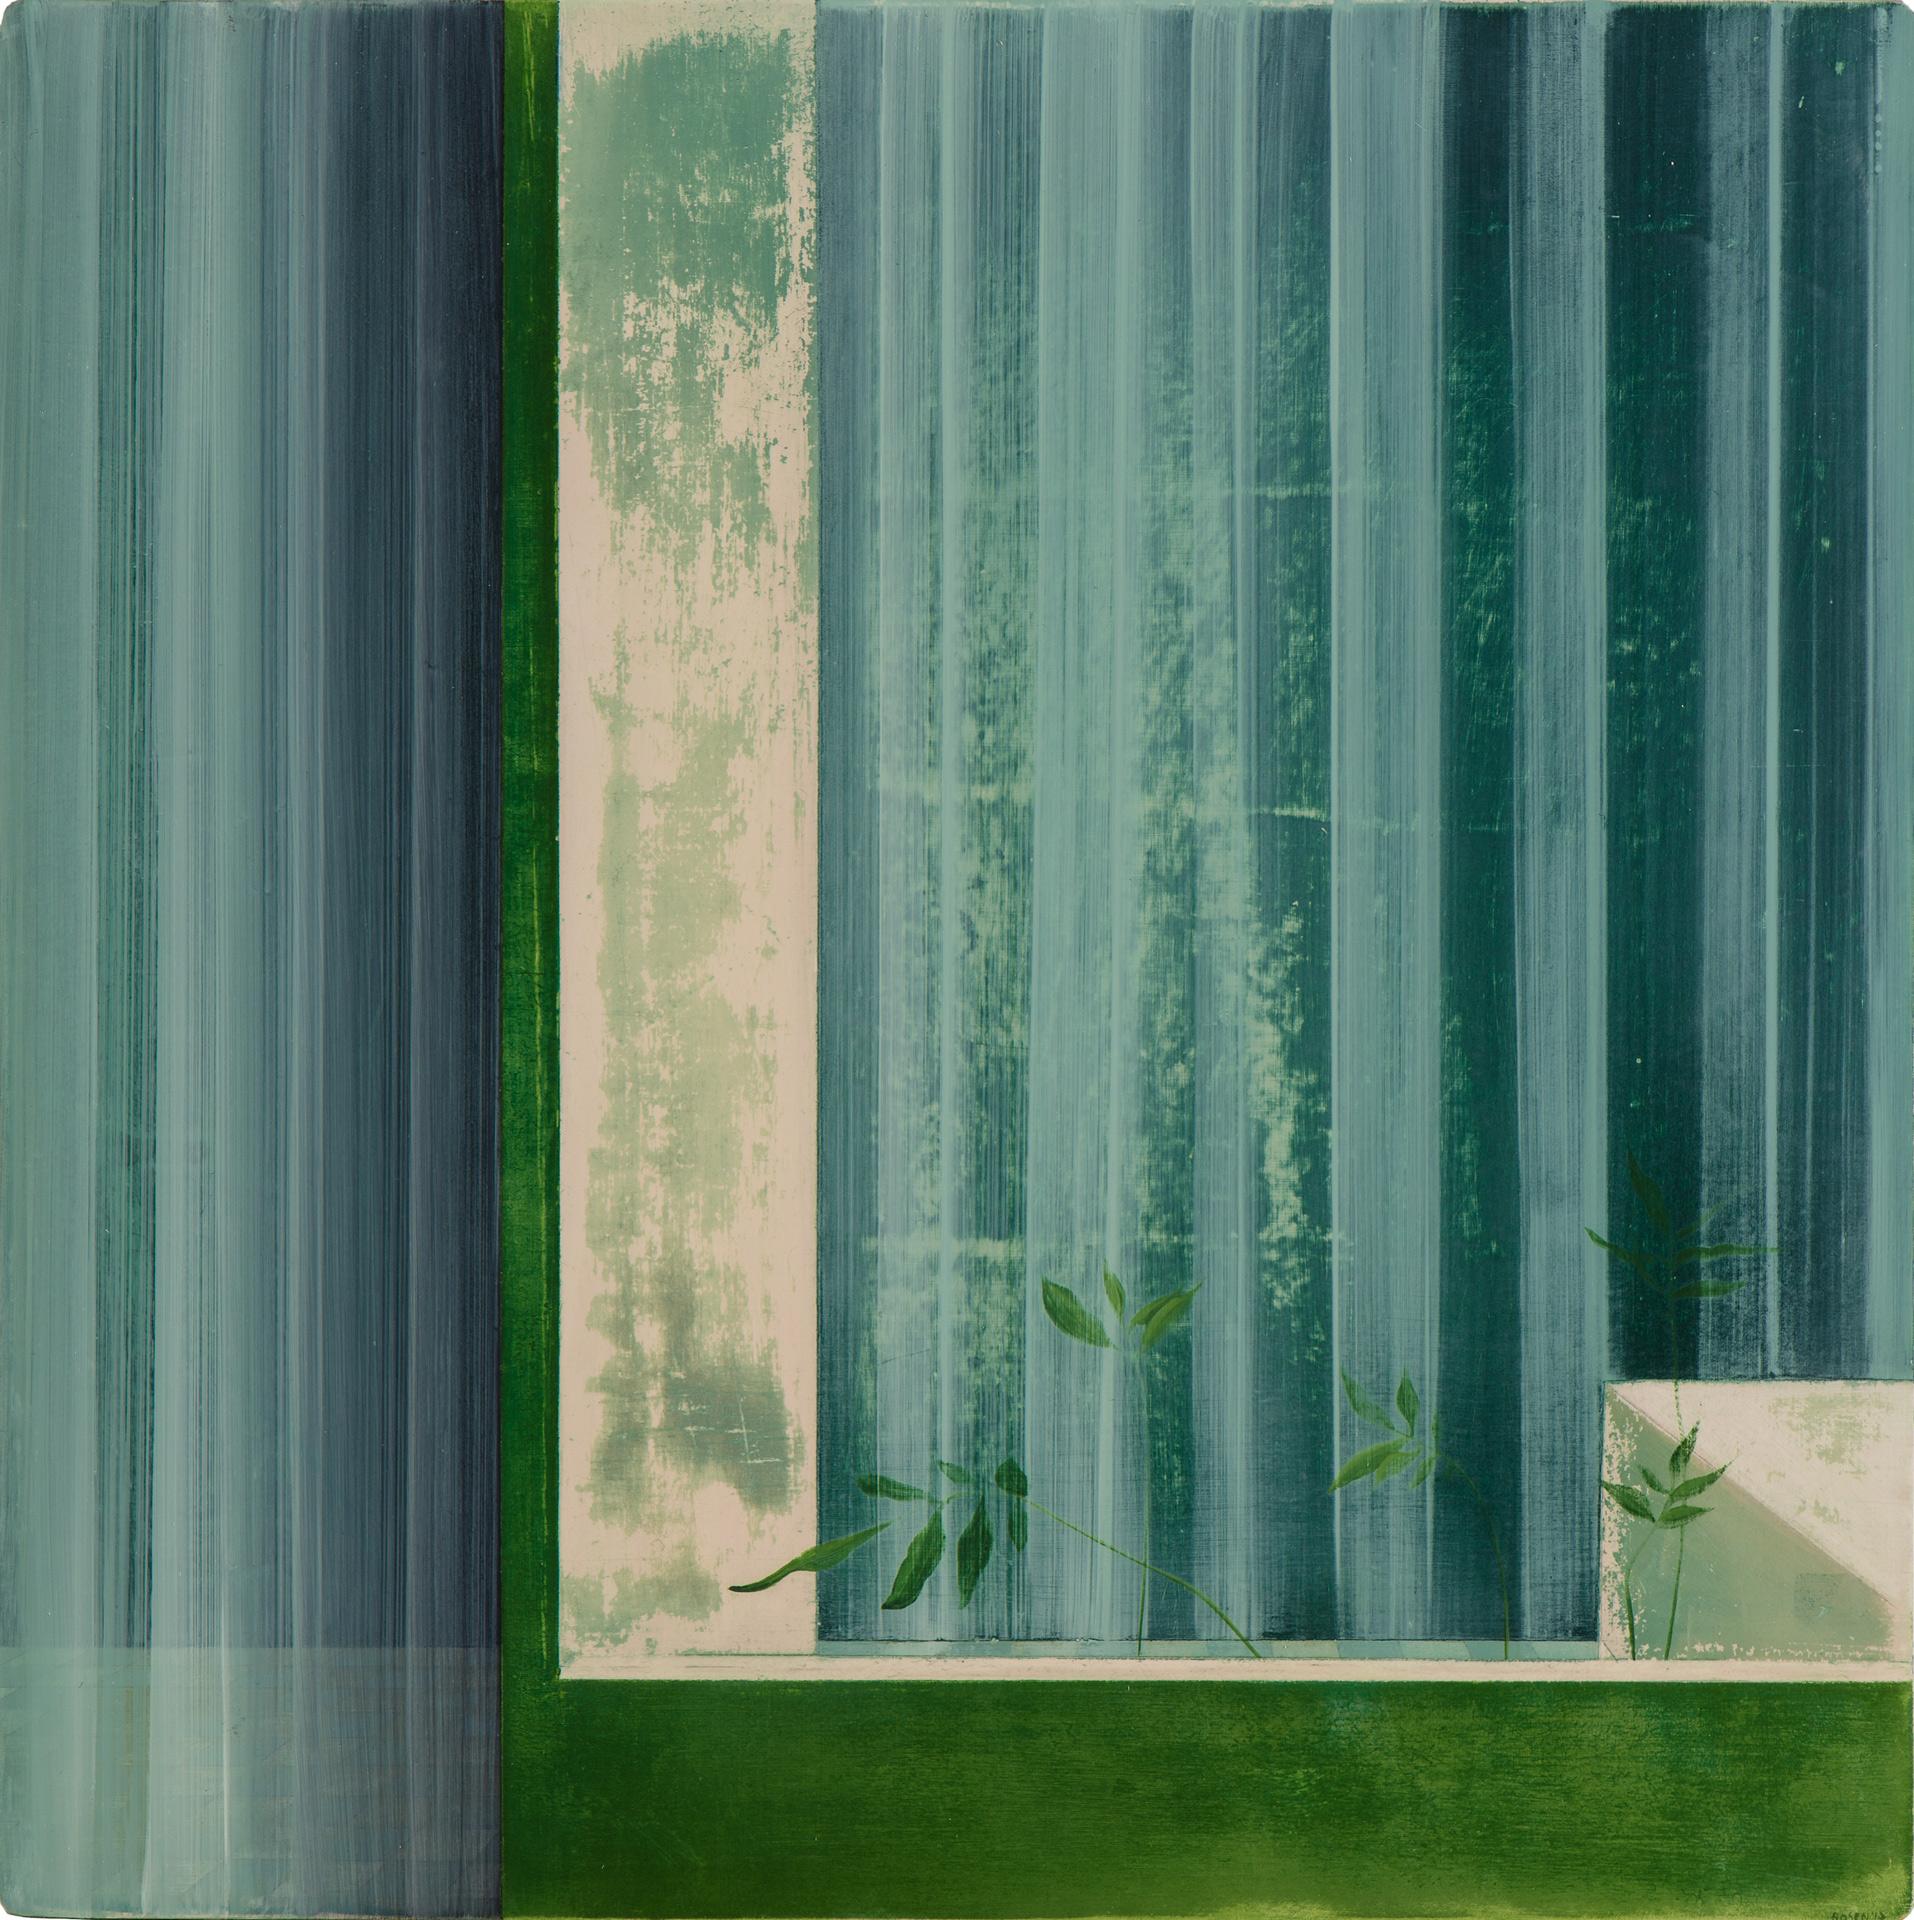 Untitled/30 x 30 cm, Oil on wood/2017